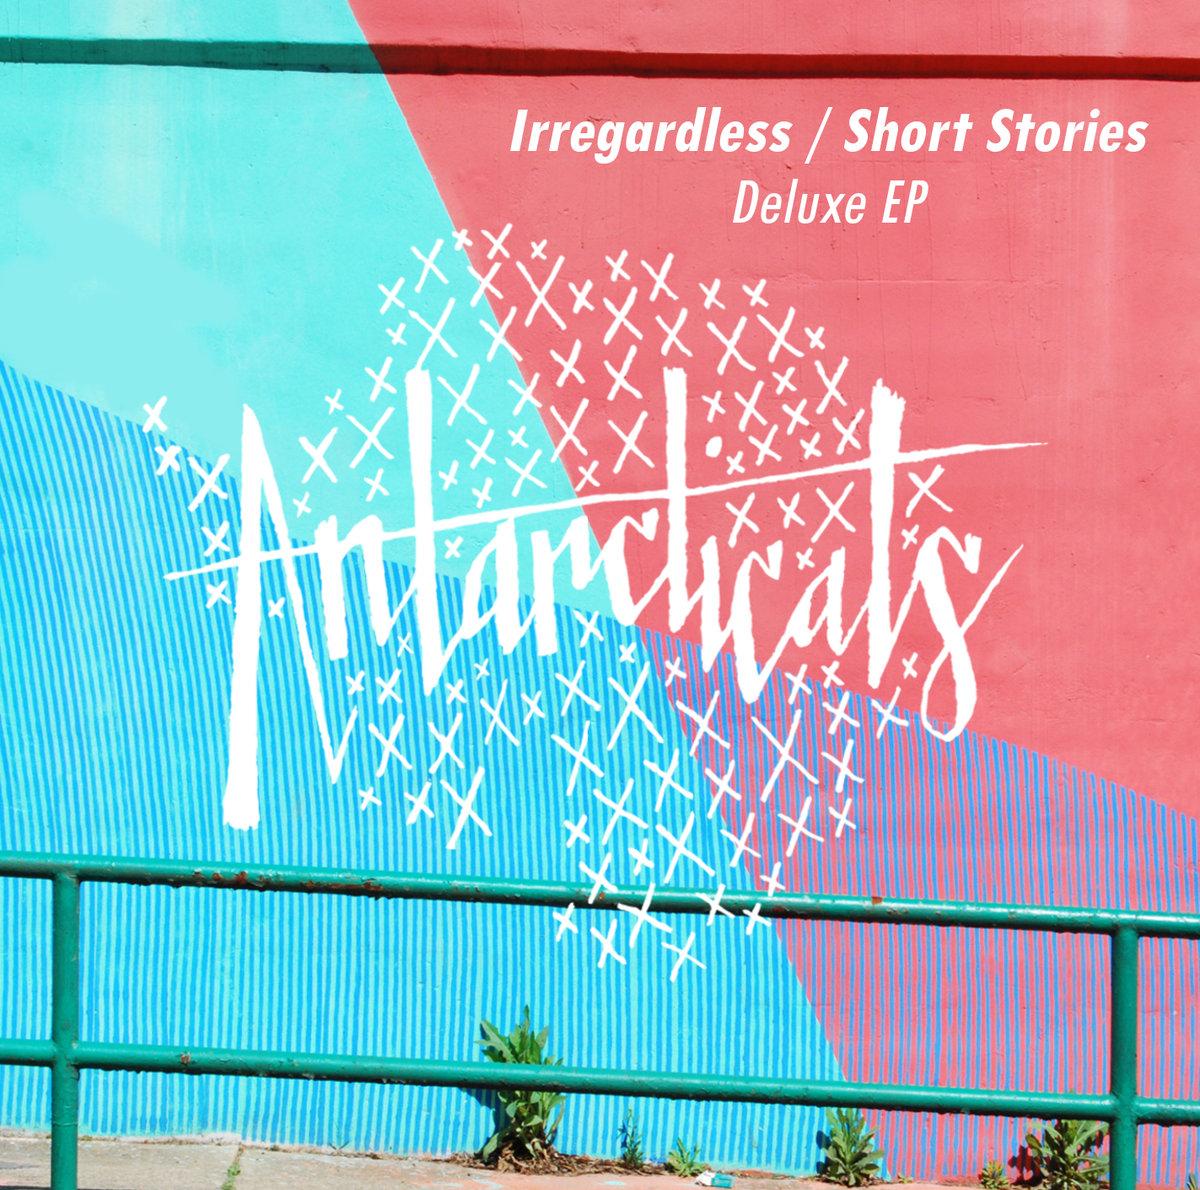 Irregardless / Short Stories Deluxe EP